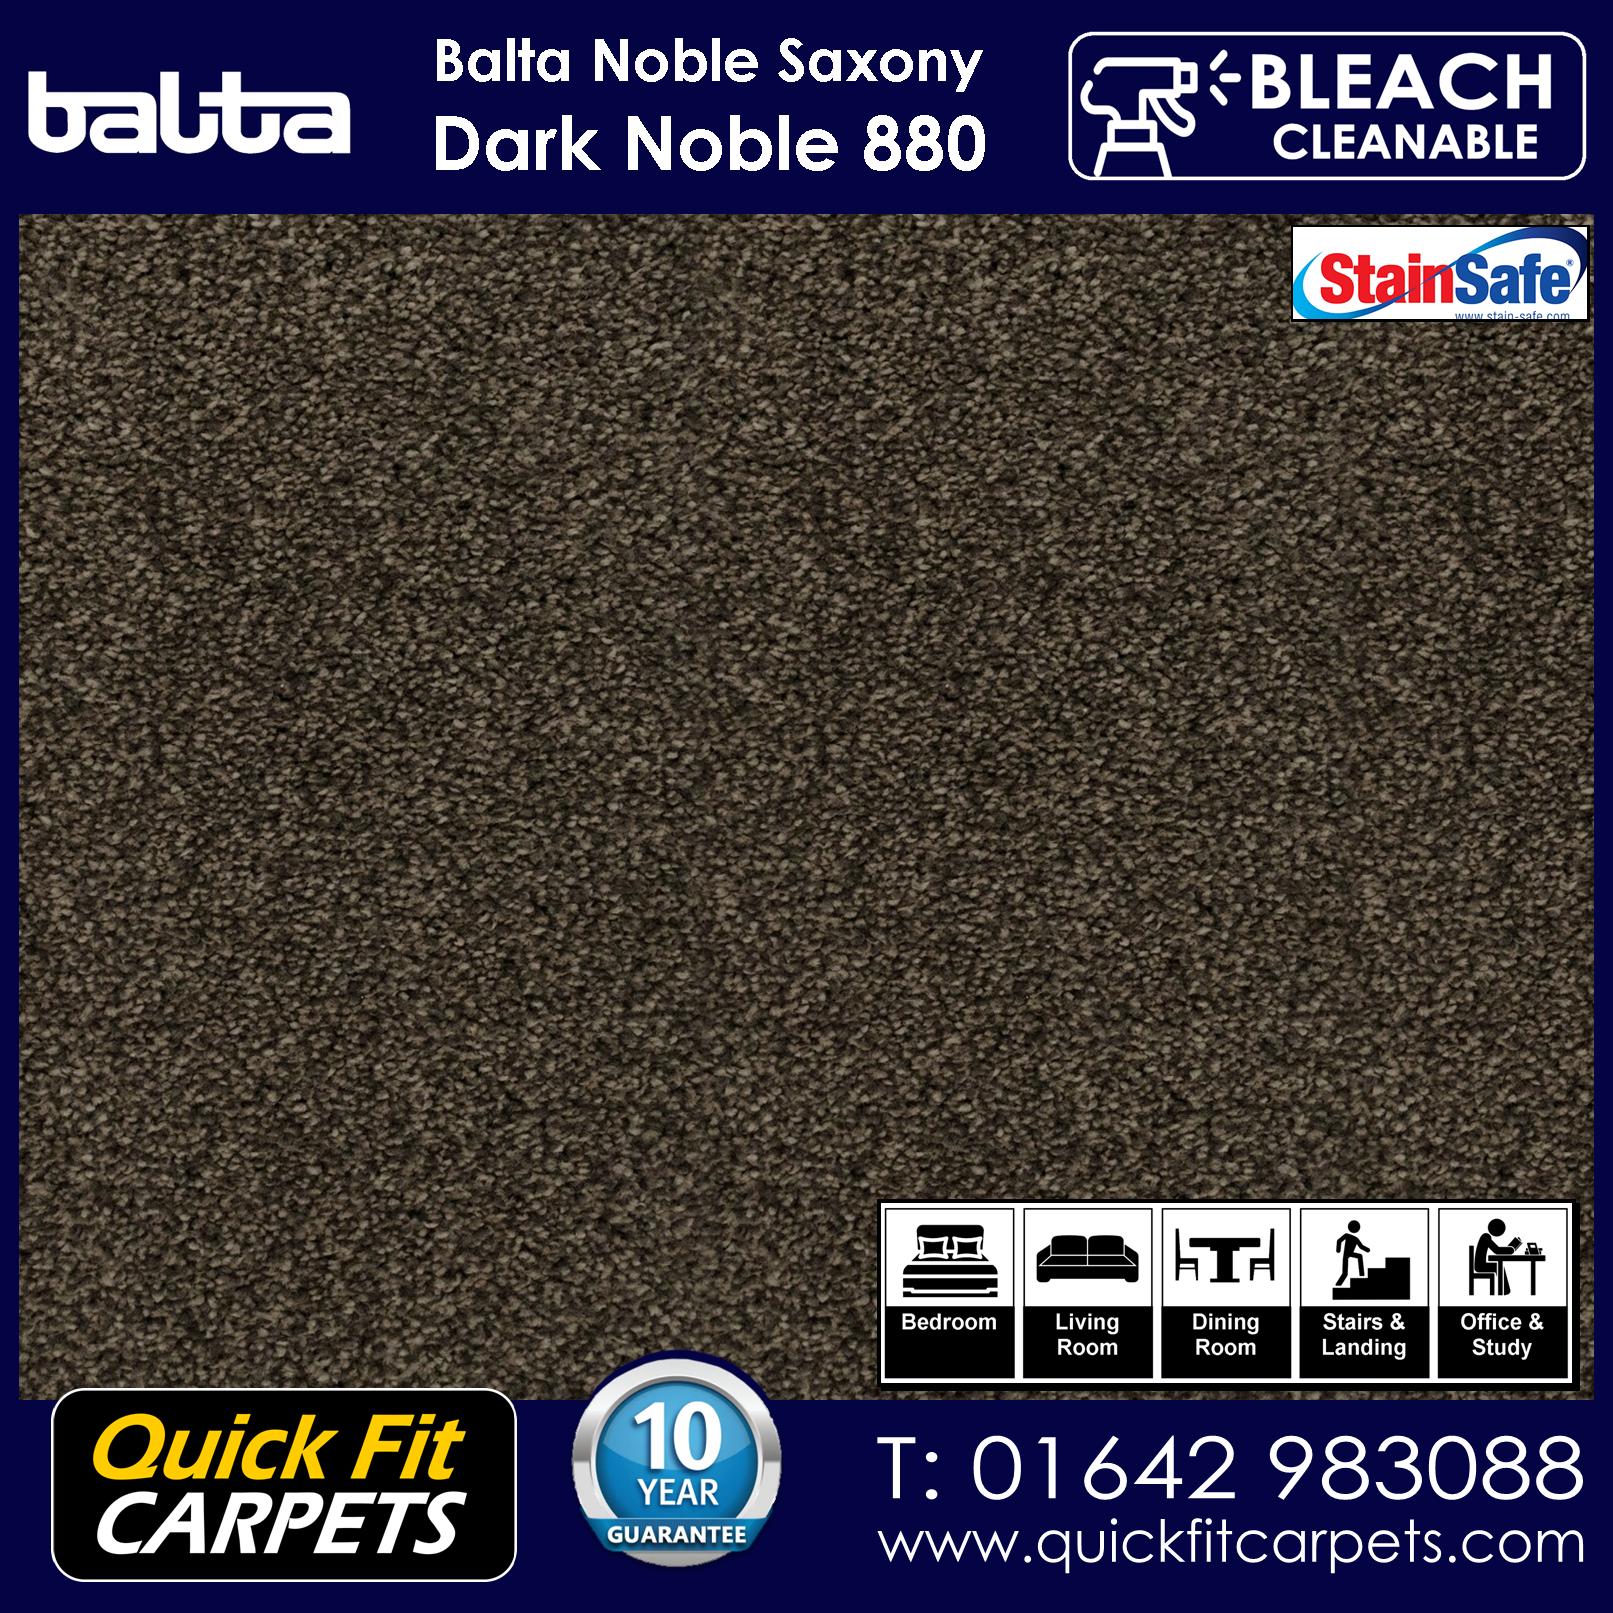 Quick Fit Carpets Balta Luxury Pile Dark Noble Stead 880